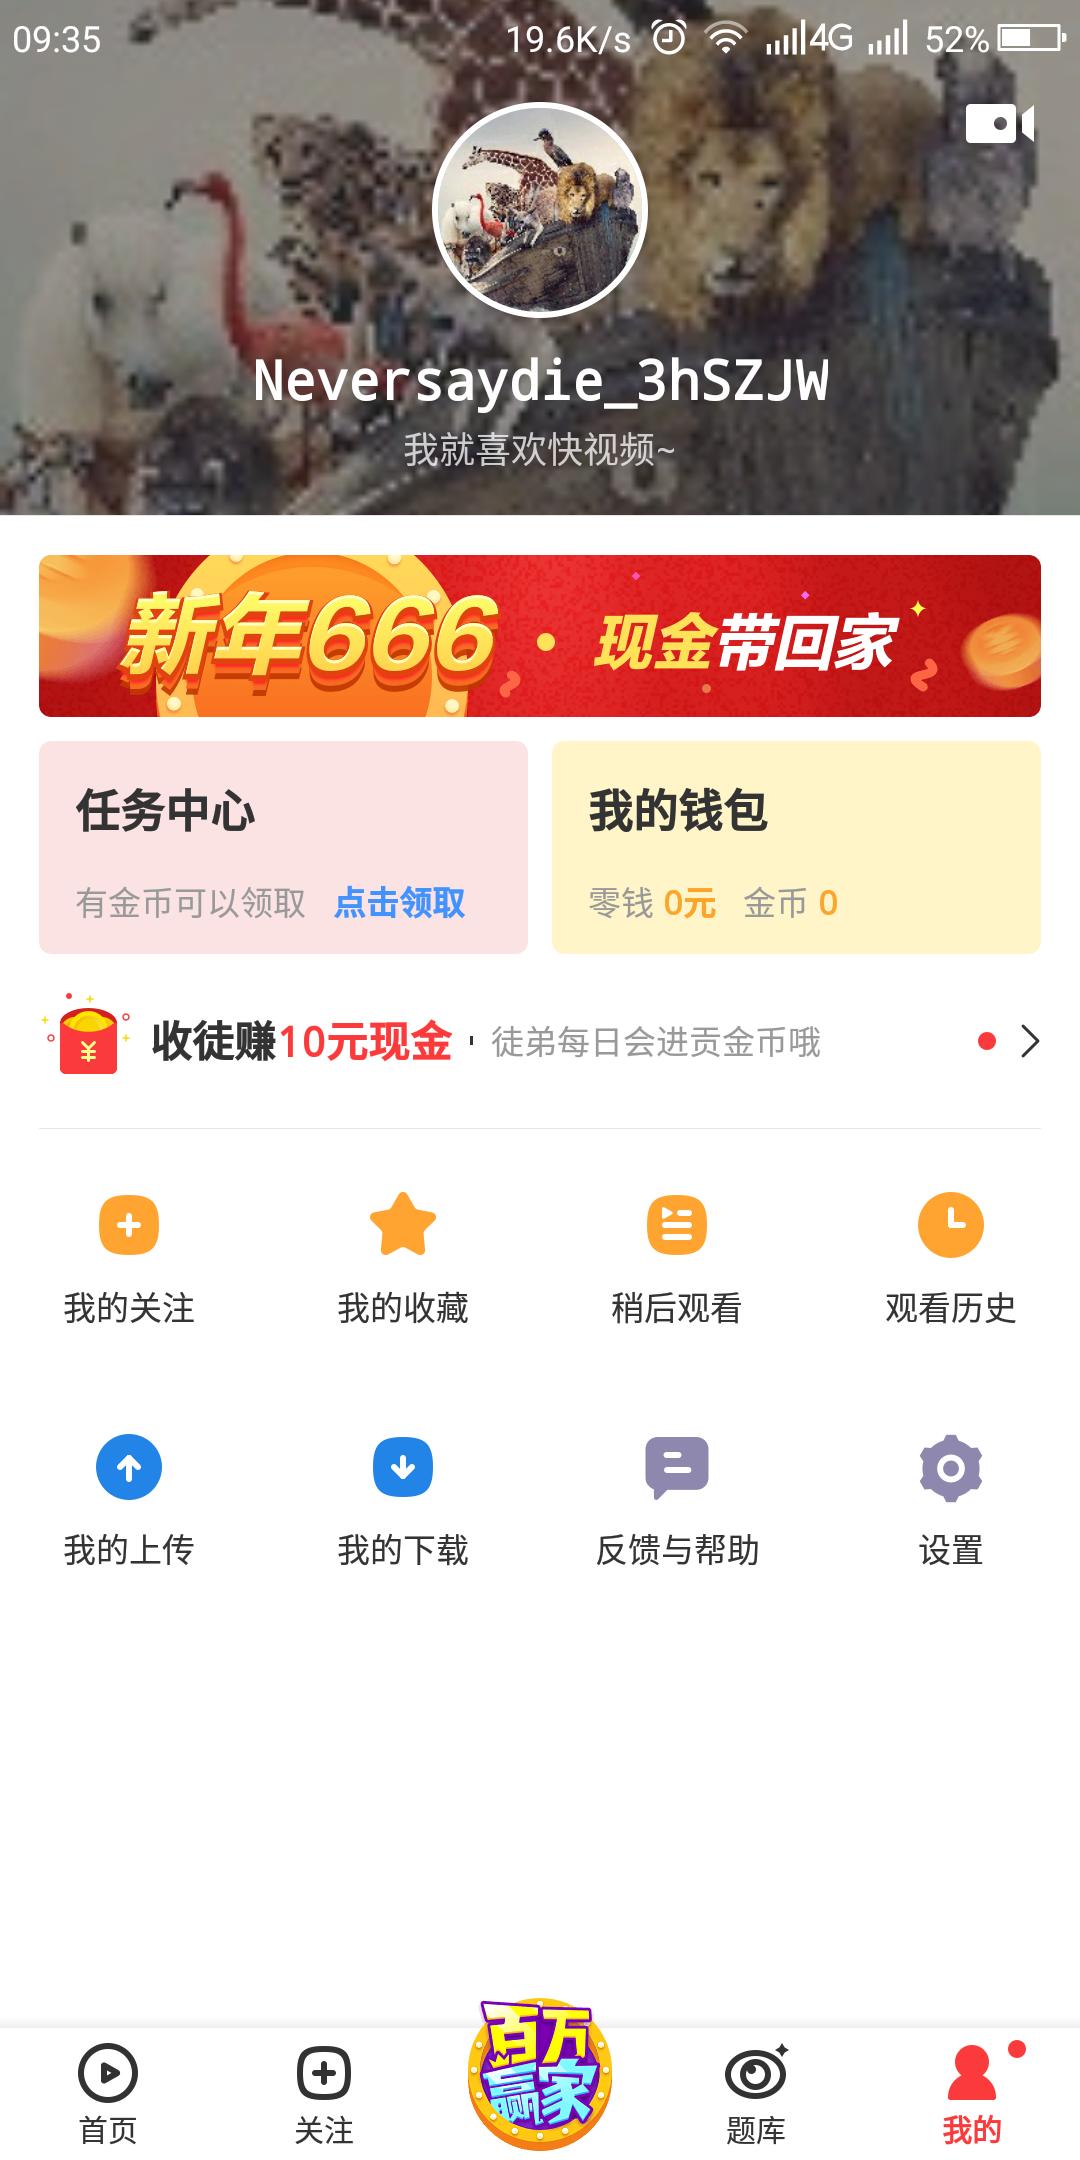 Screenshot_2018-02-09-09-35-52.png